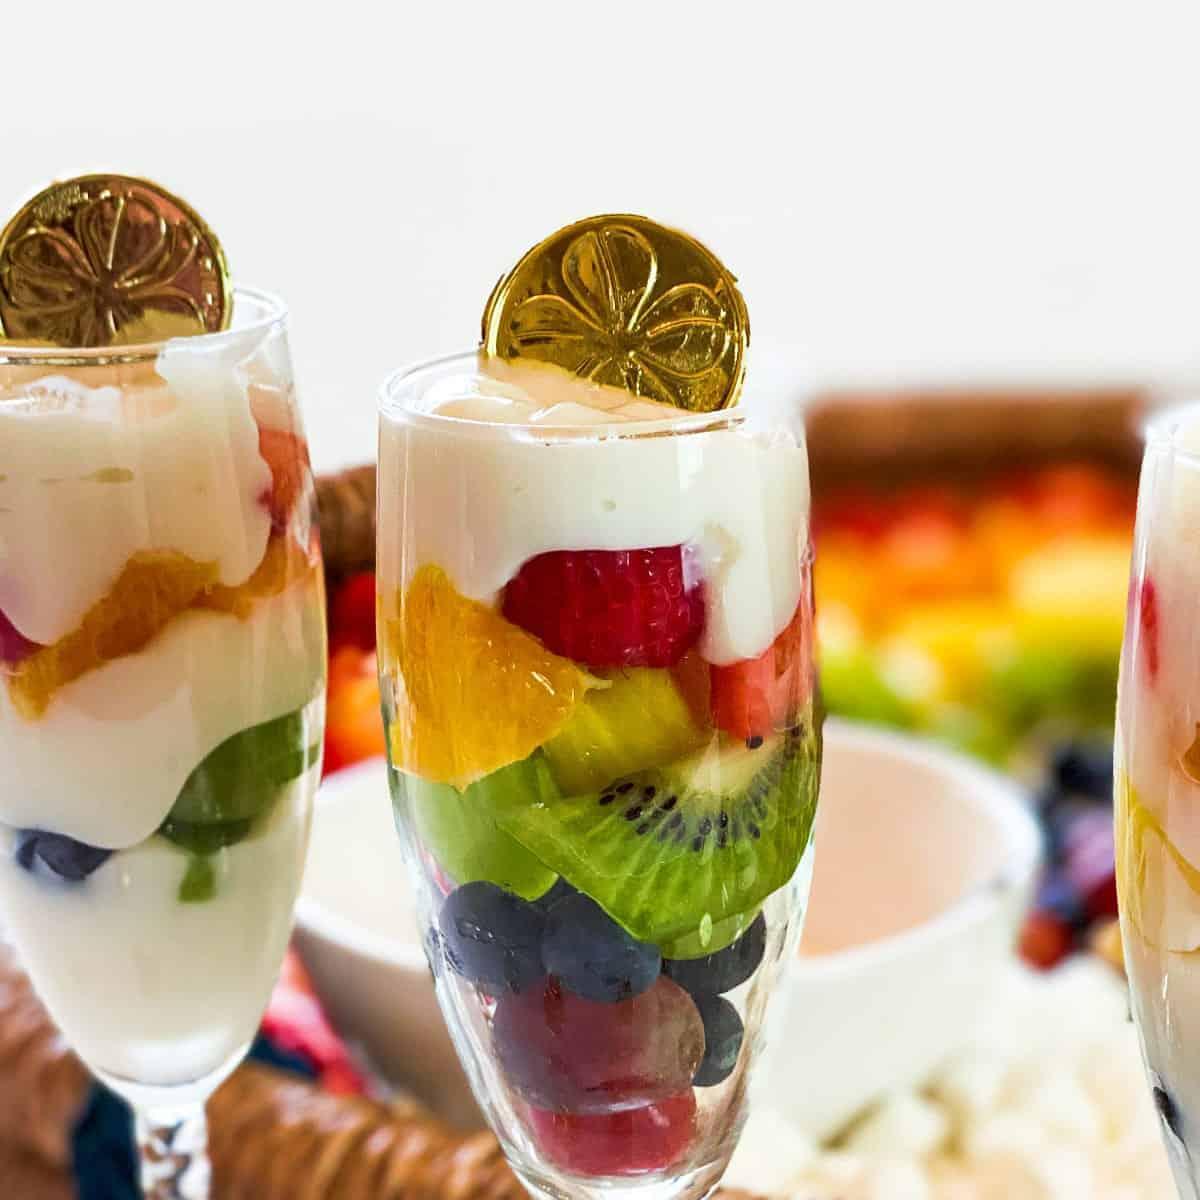 Three yogurt parfait glasses in front of rainbow charcuterie board